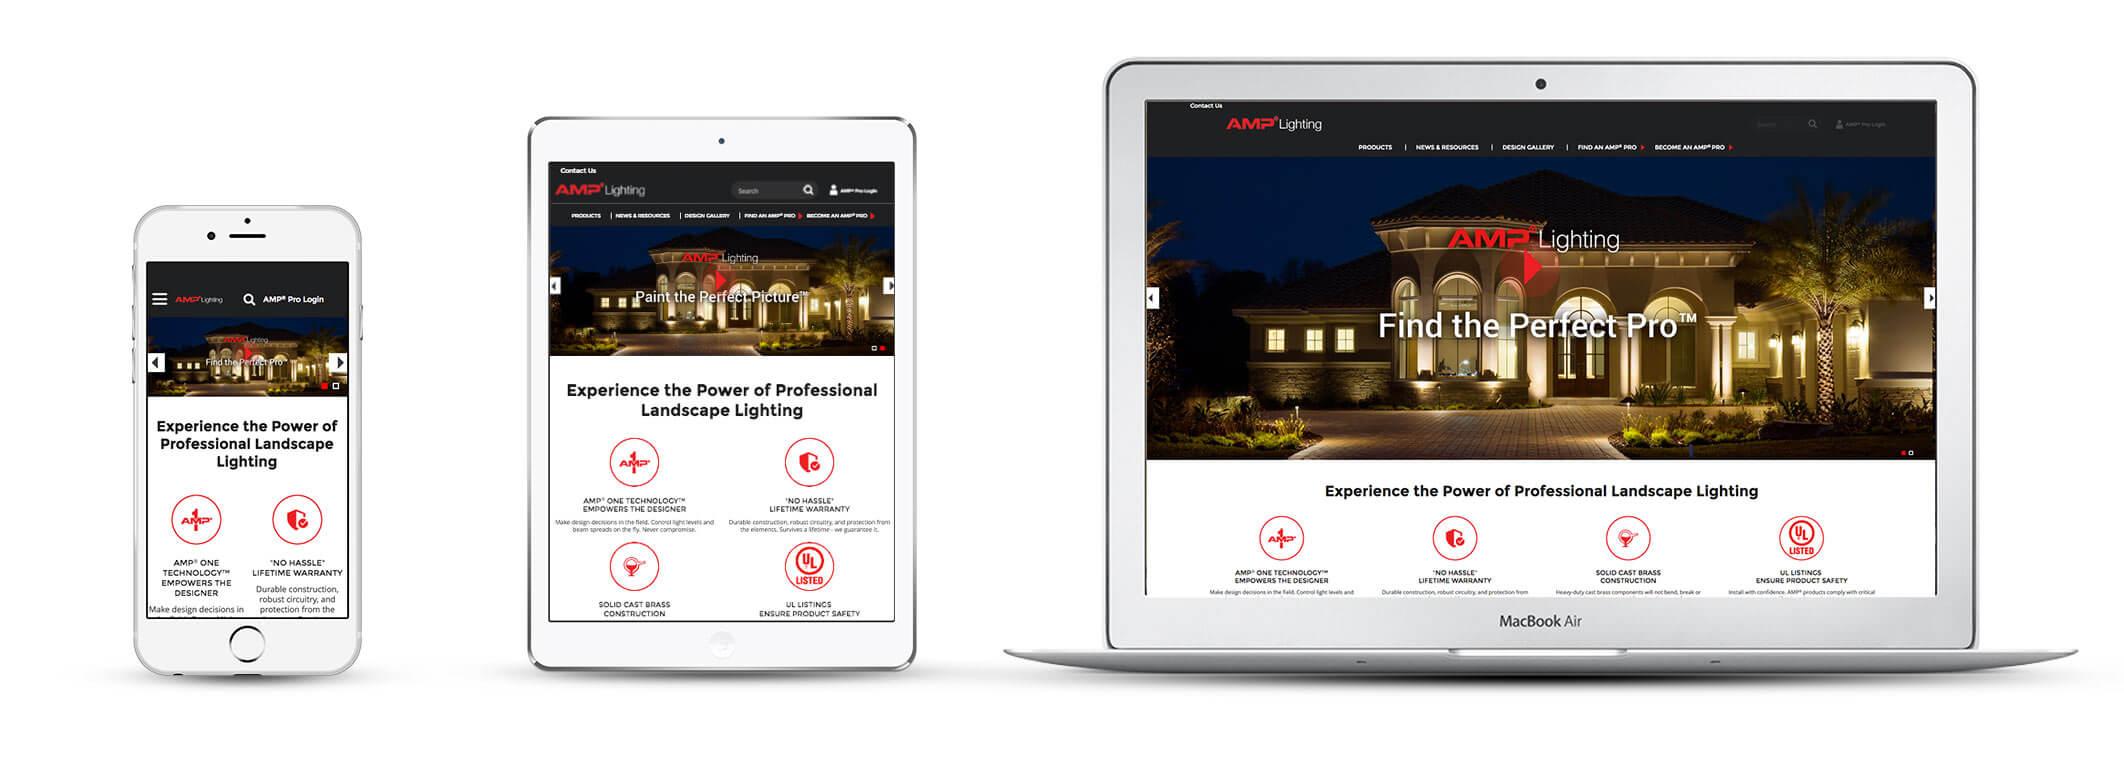 Echidna Amp Lighting Website Design Across Devices